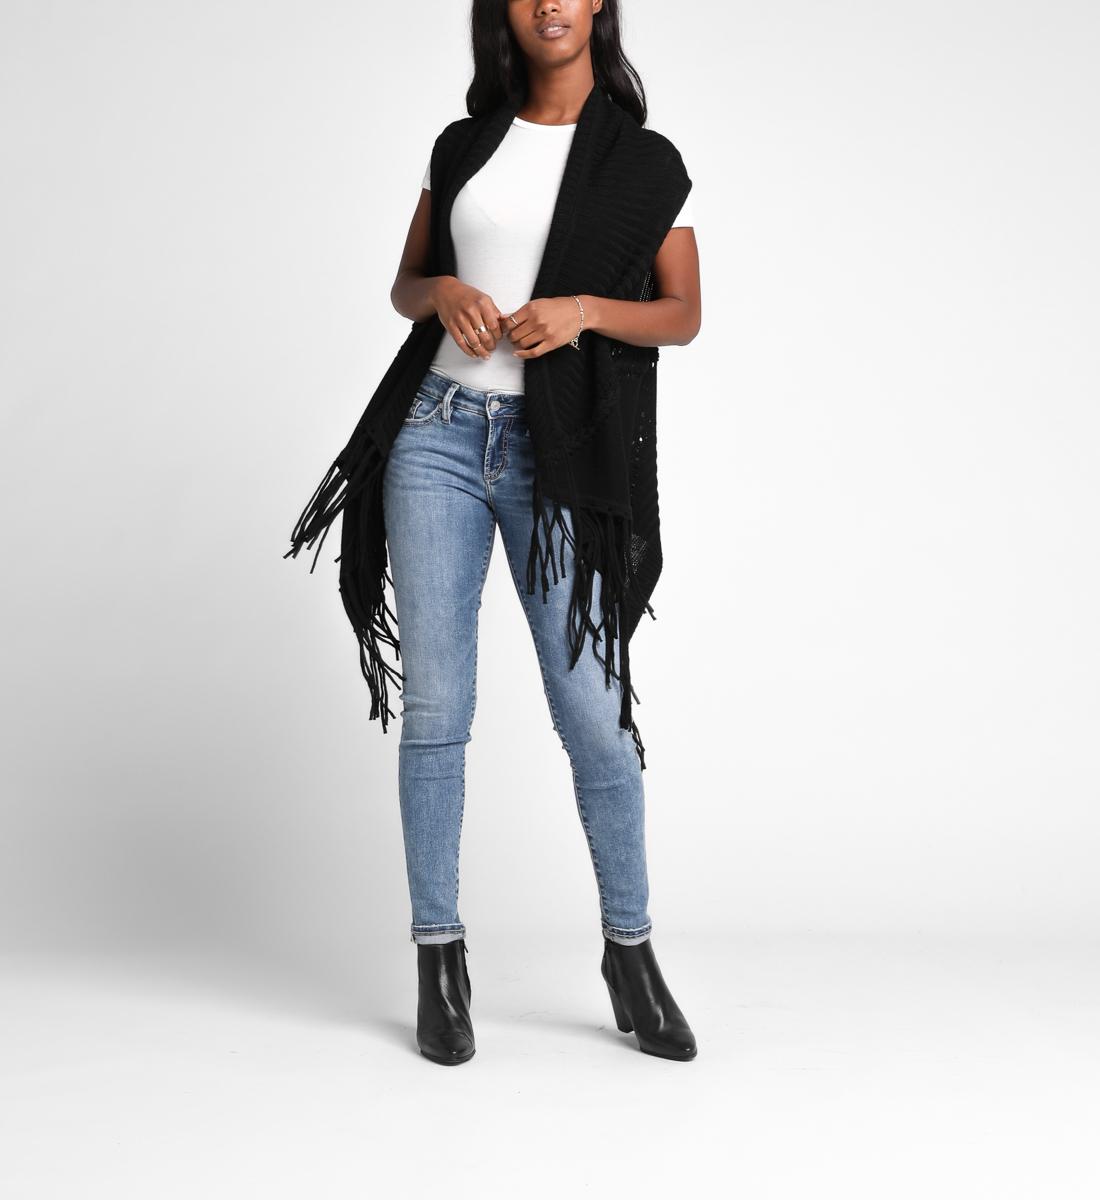 Silver Jeans Parker in Black